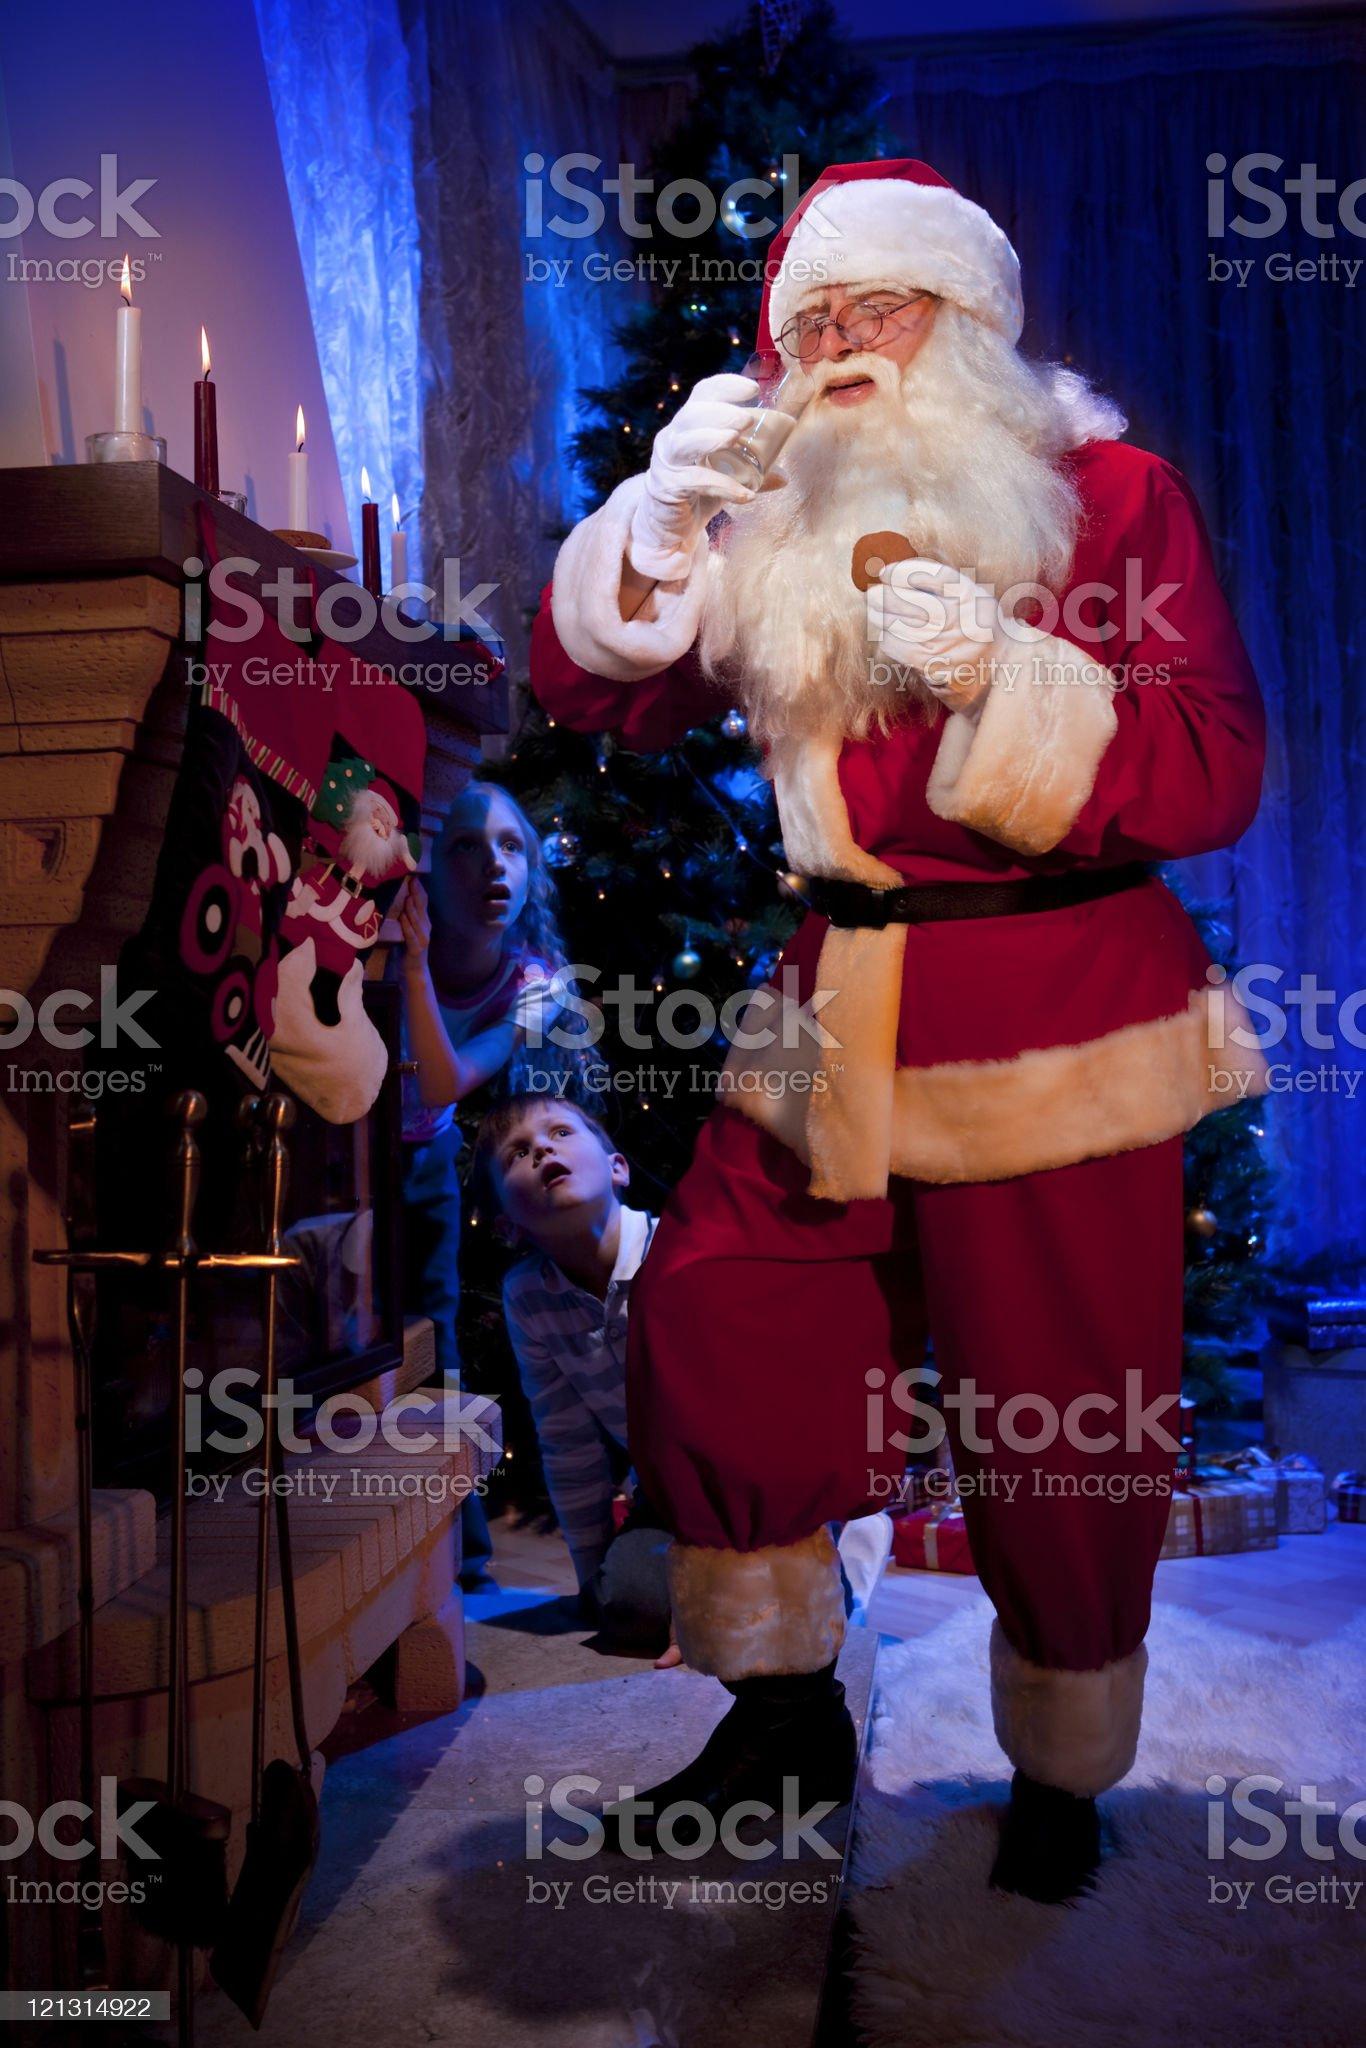 Children spying how Santa drinking milk. royalty-free stock photo